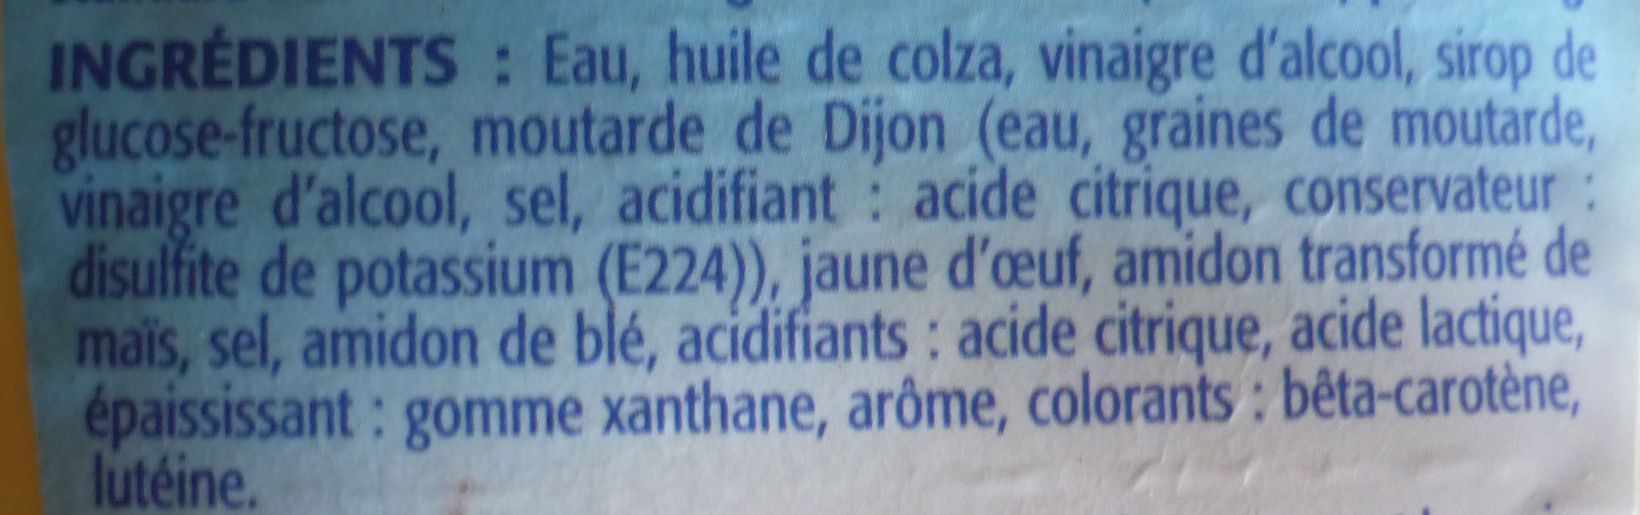 Mayonnaise légère - Ingredients - fr